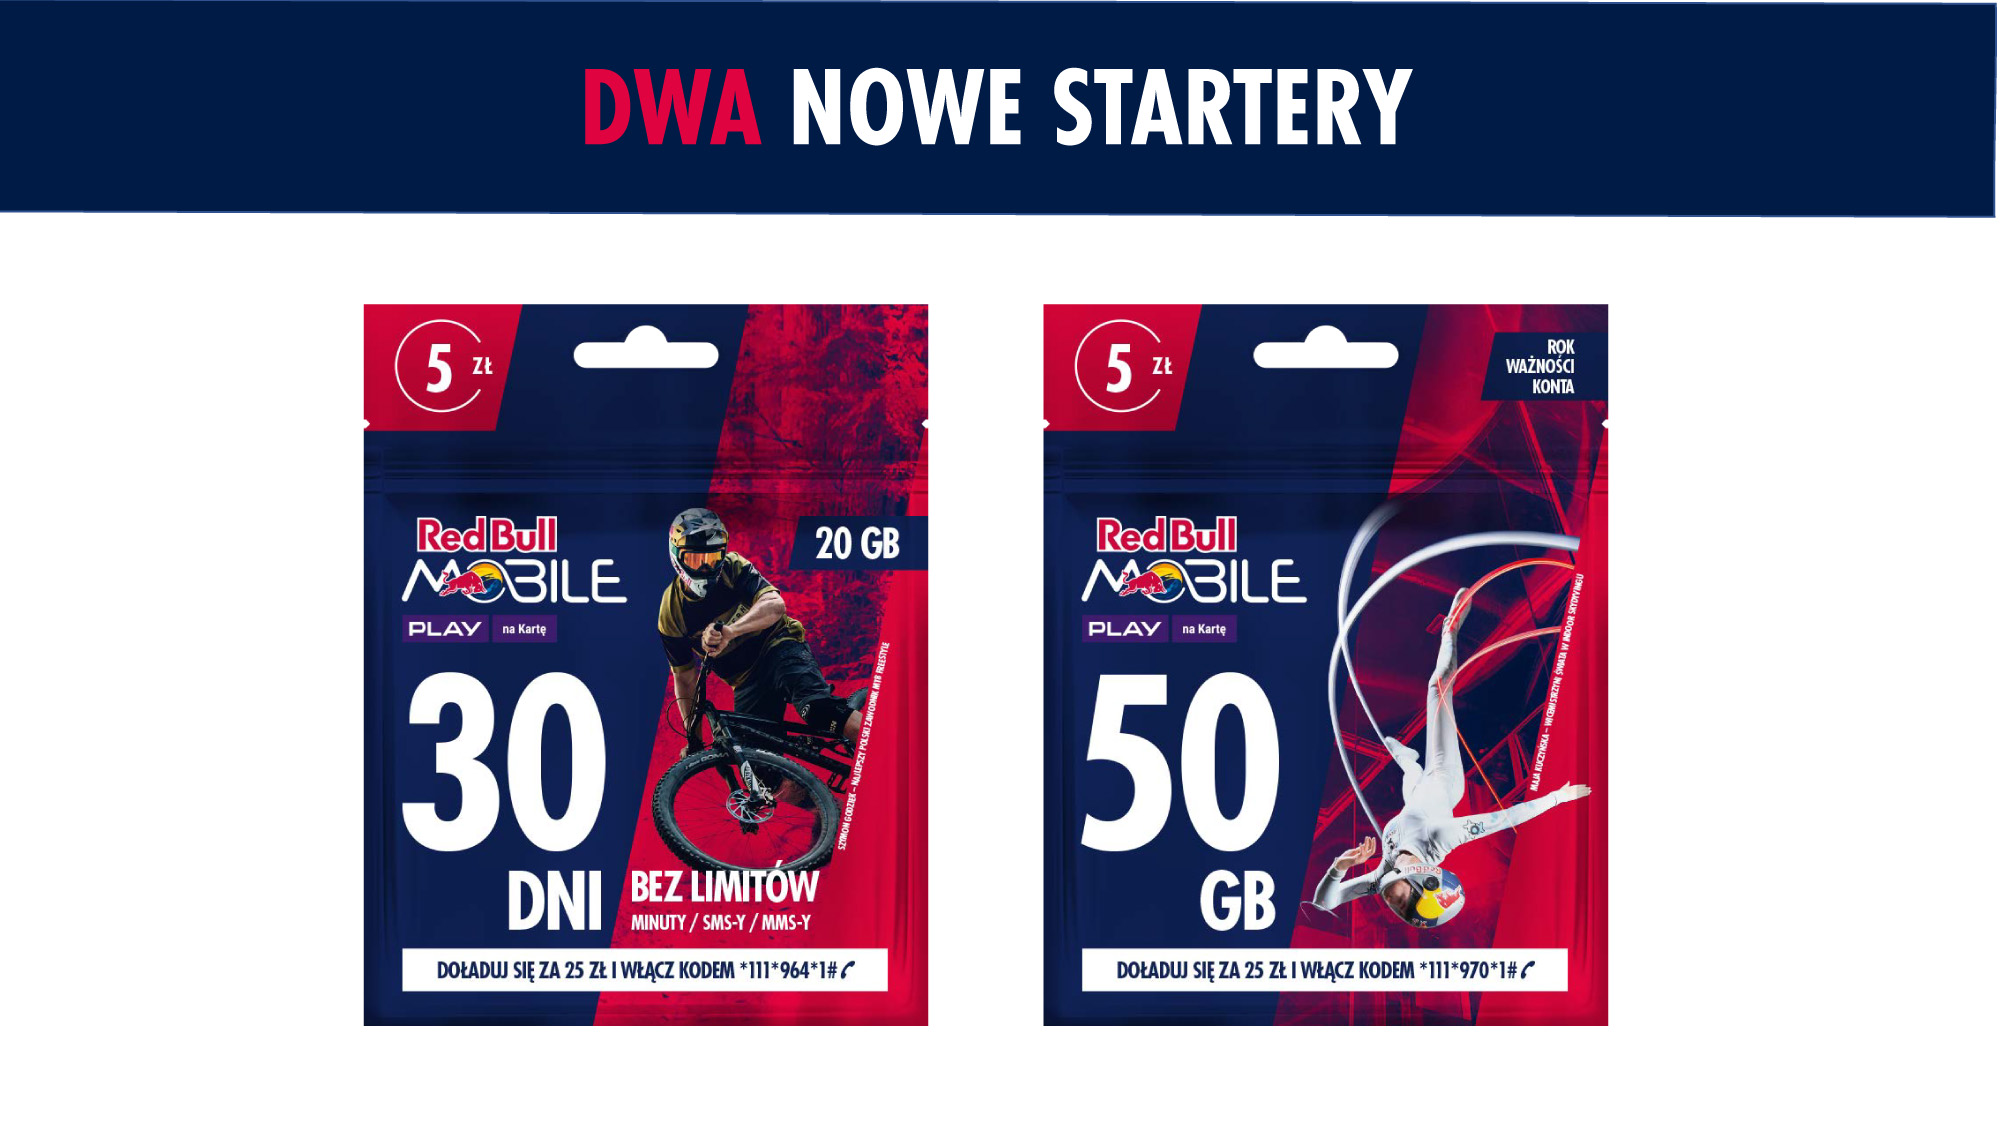 Red Bull Mobile Nowa Oferta Abonamentowa I Na Karte